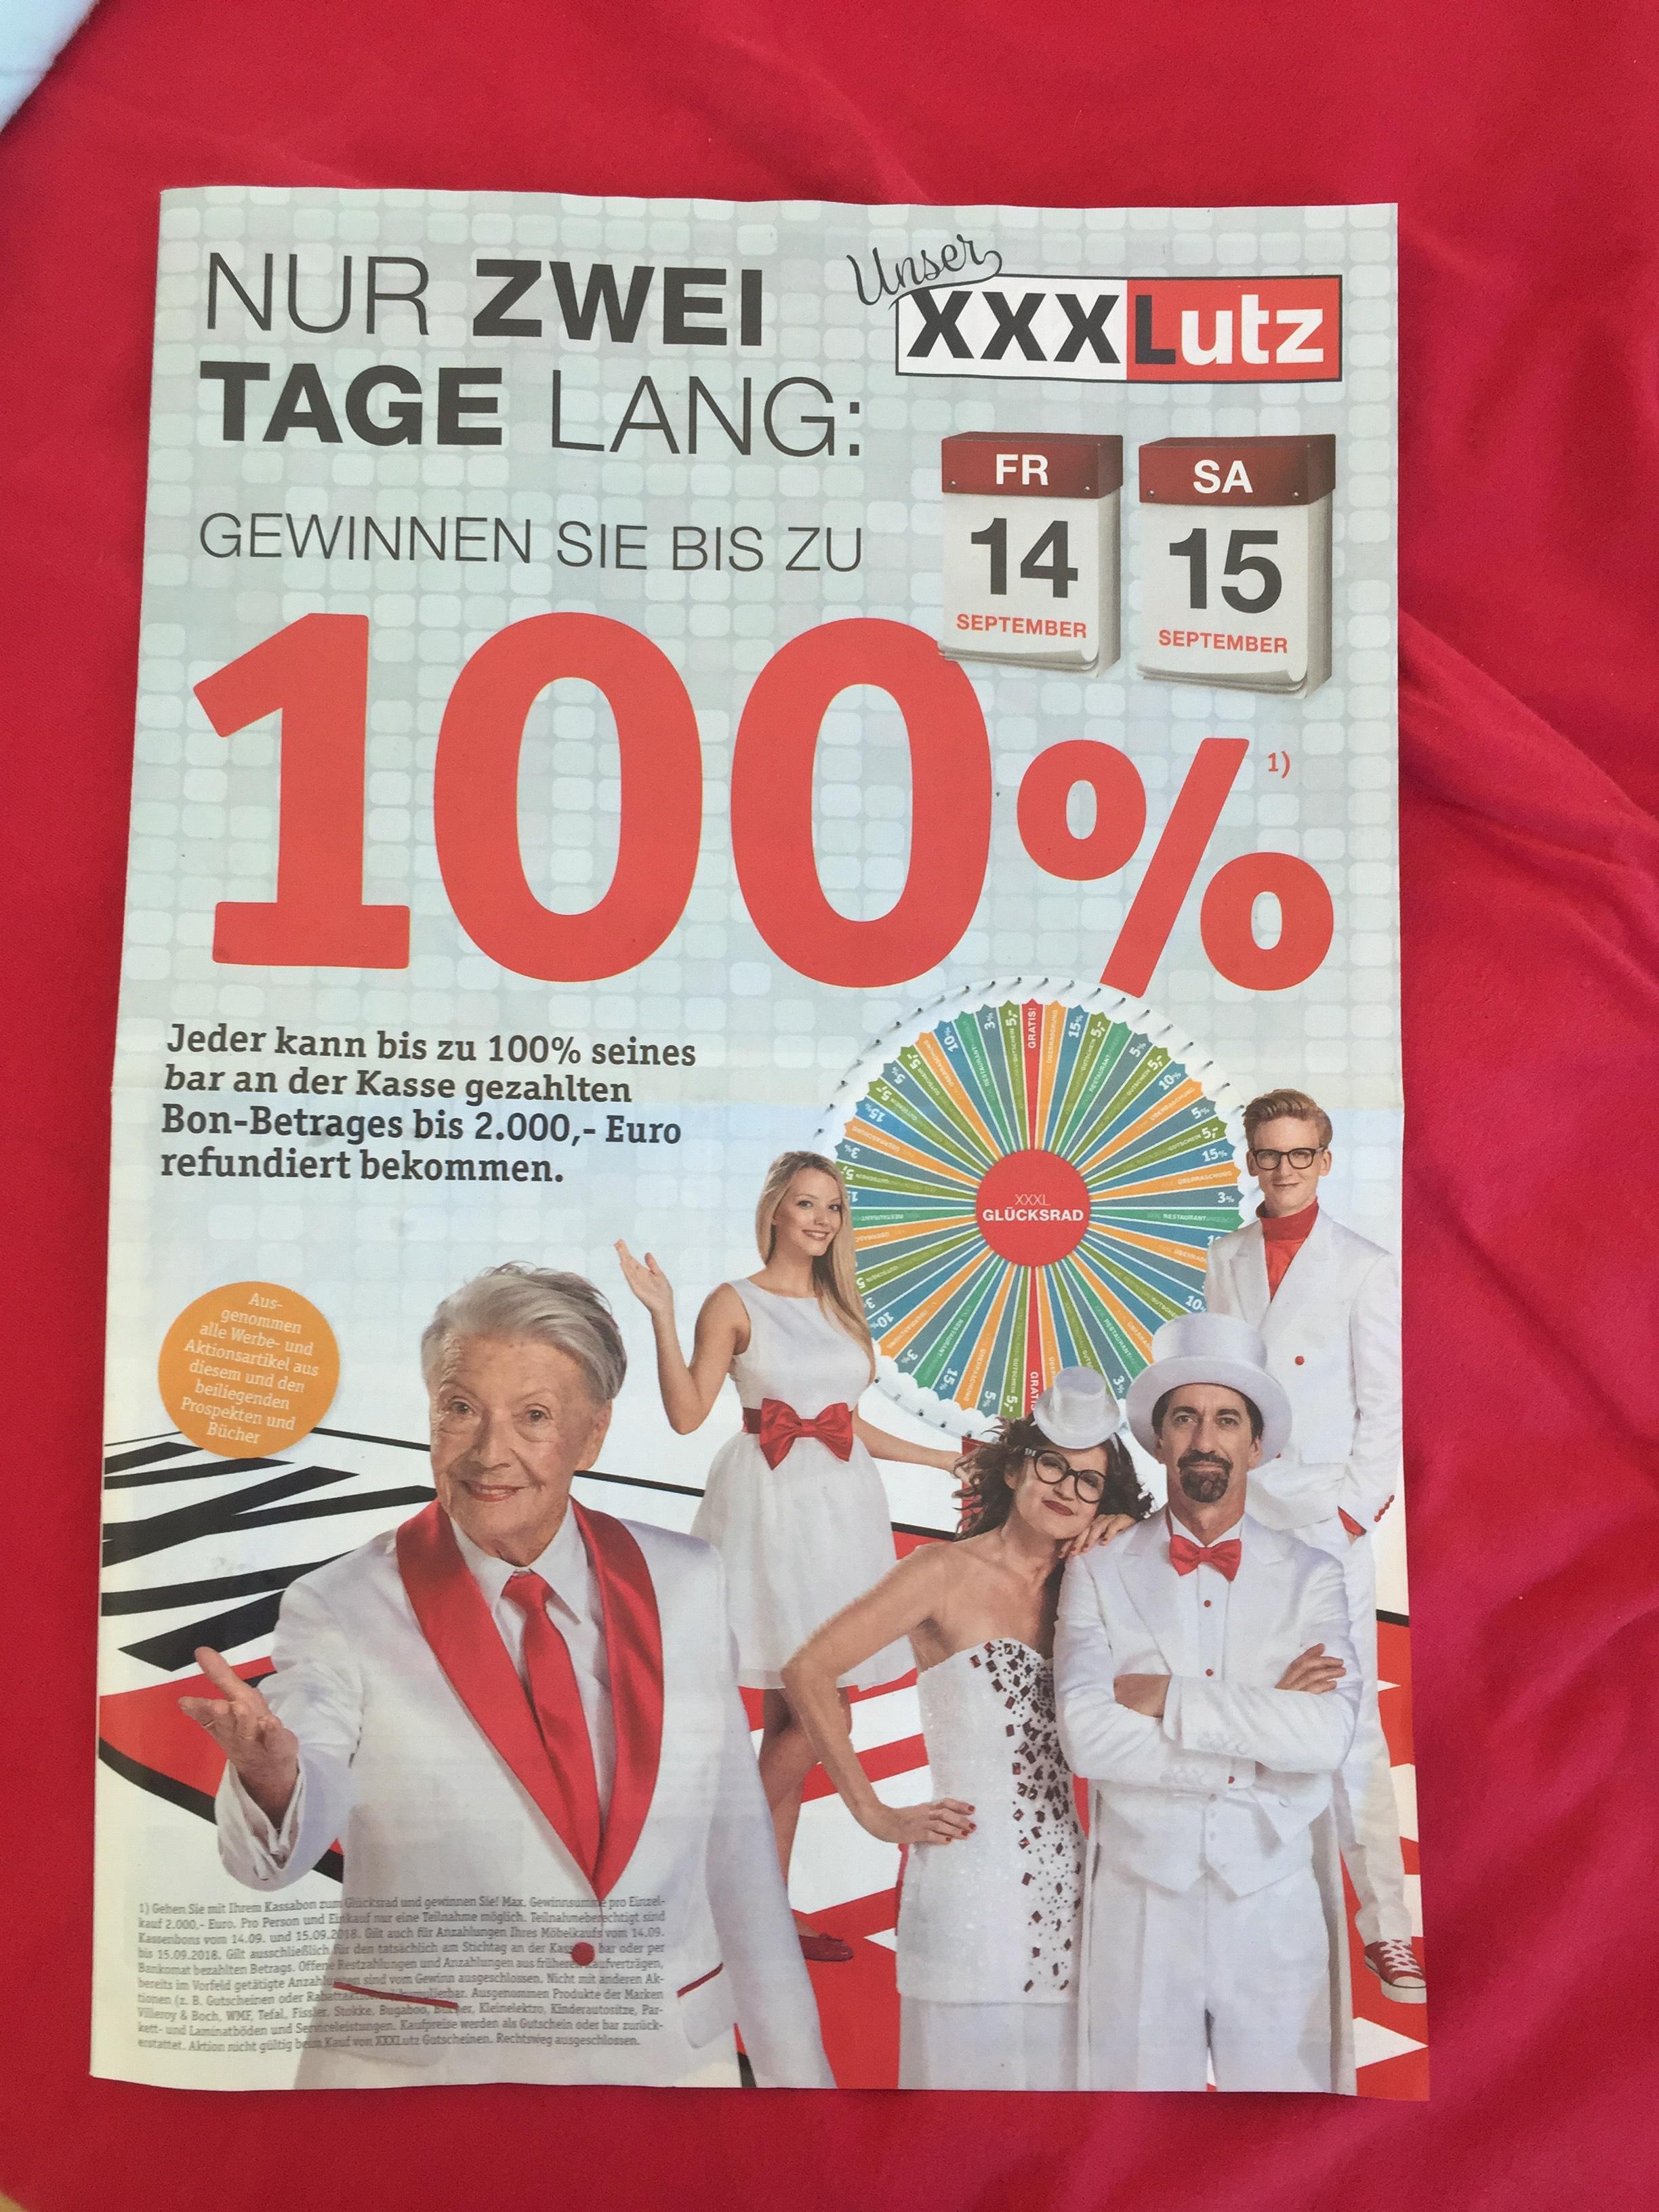 Mbel lutz sthle fabulous xxx lutz prospekt with mbel lutz for Mondo jugendzimmer xxl lutz